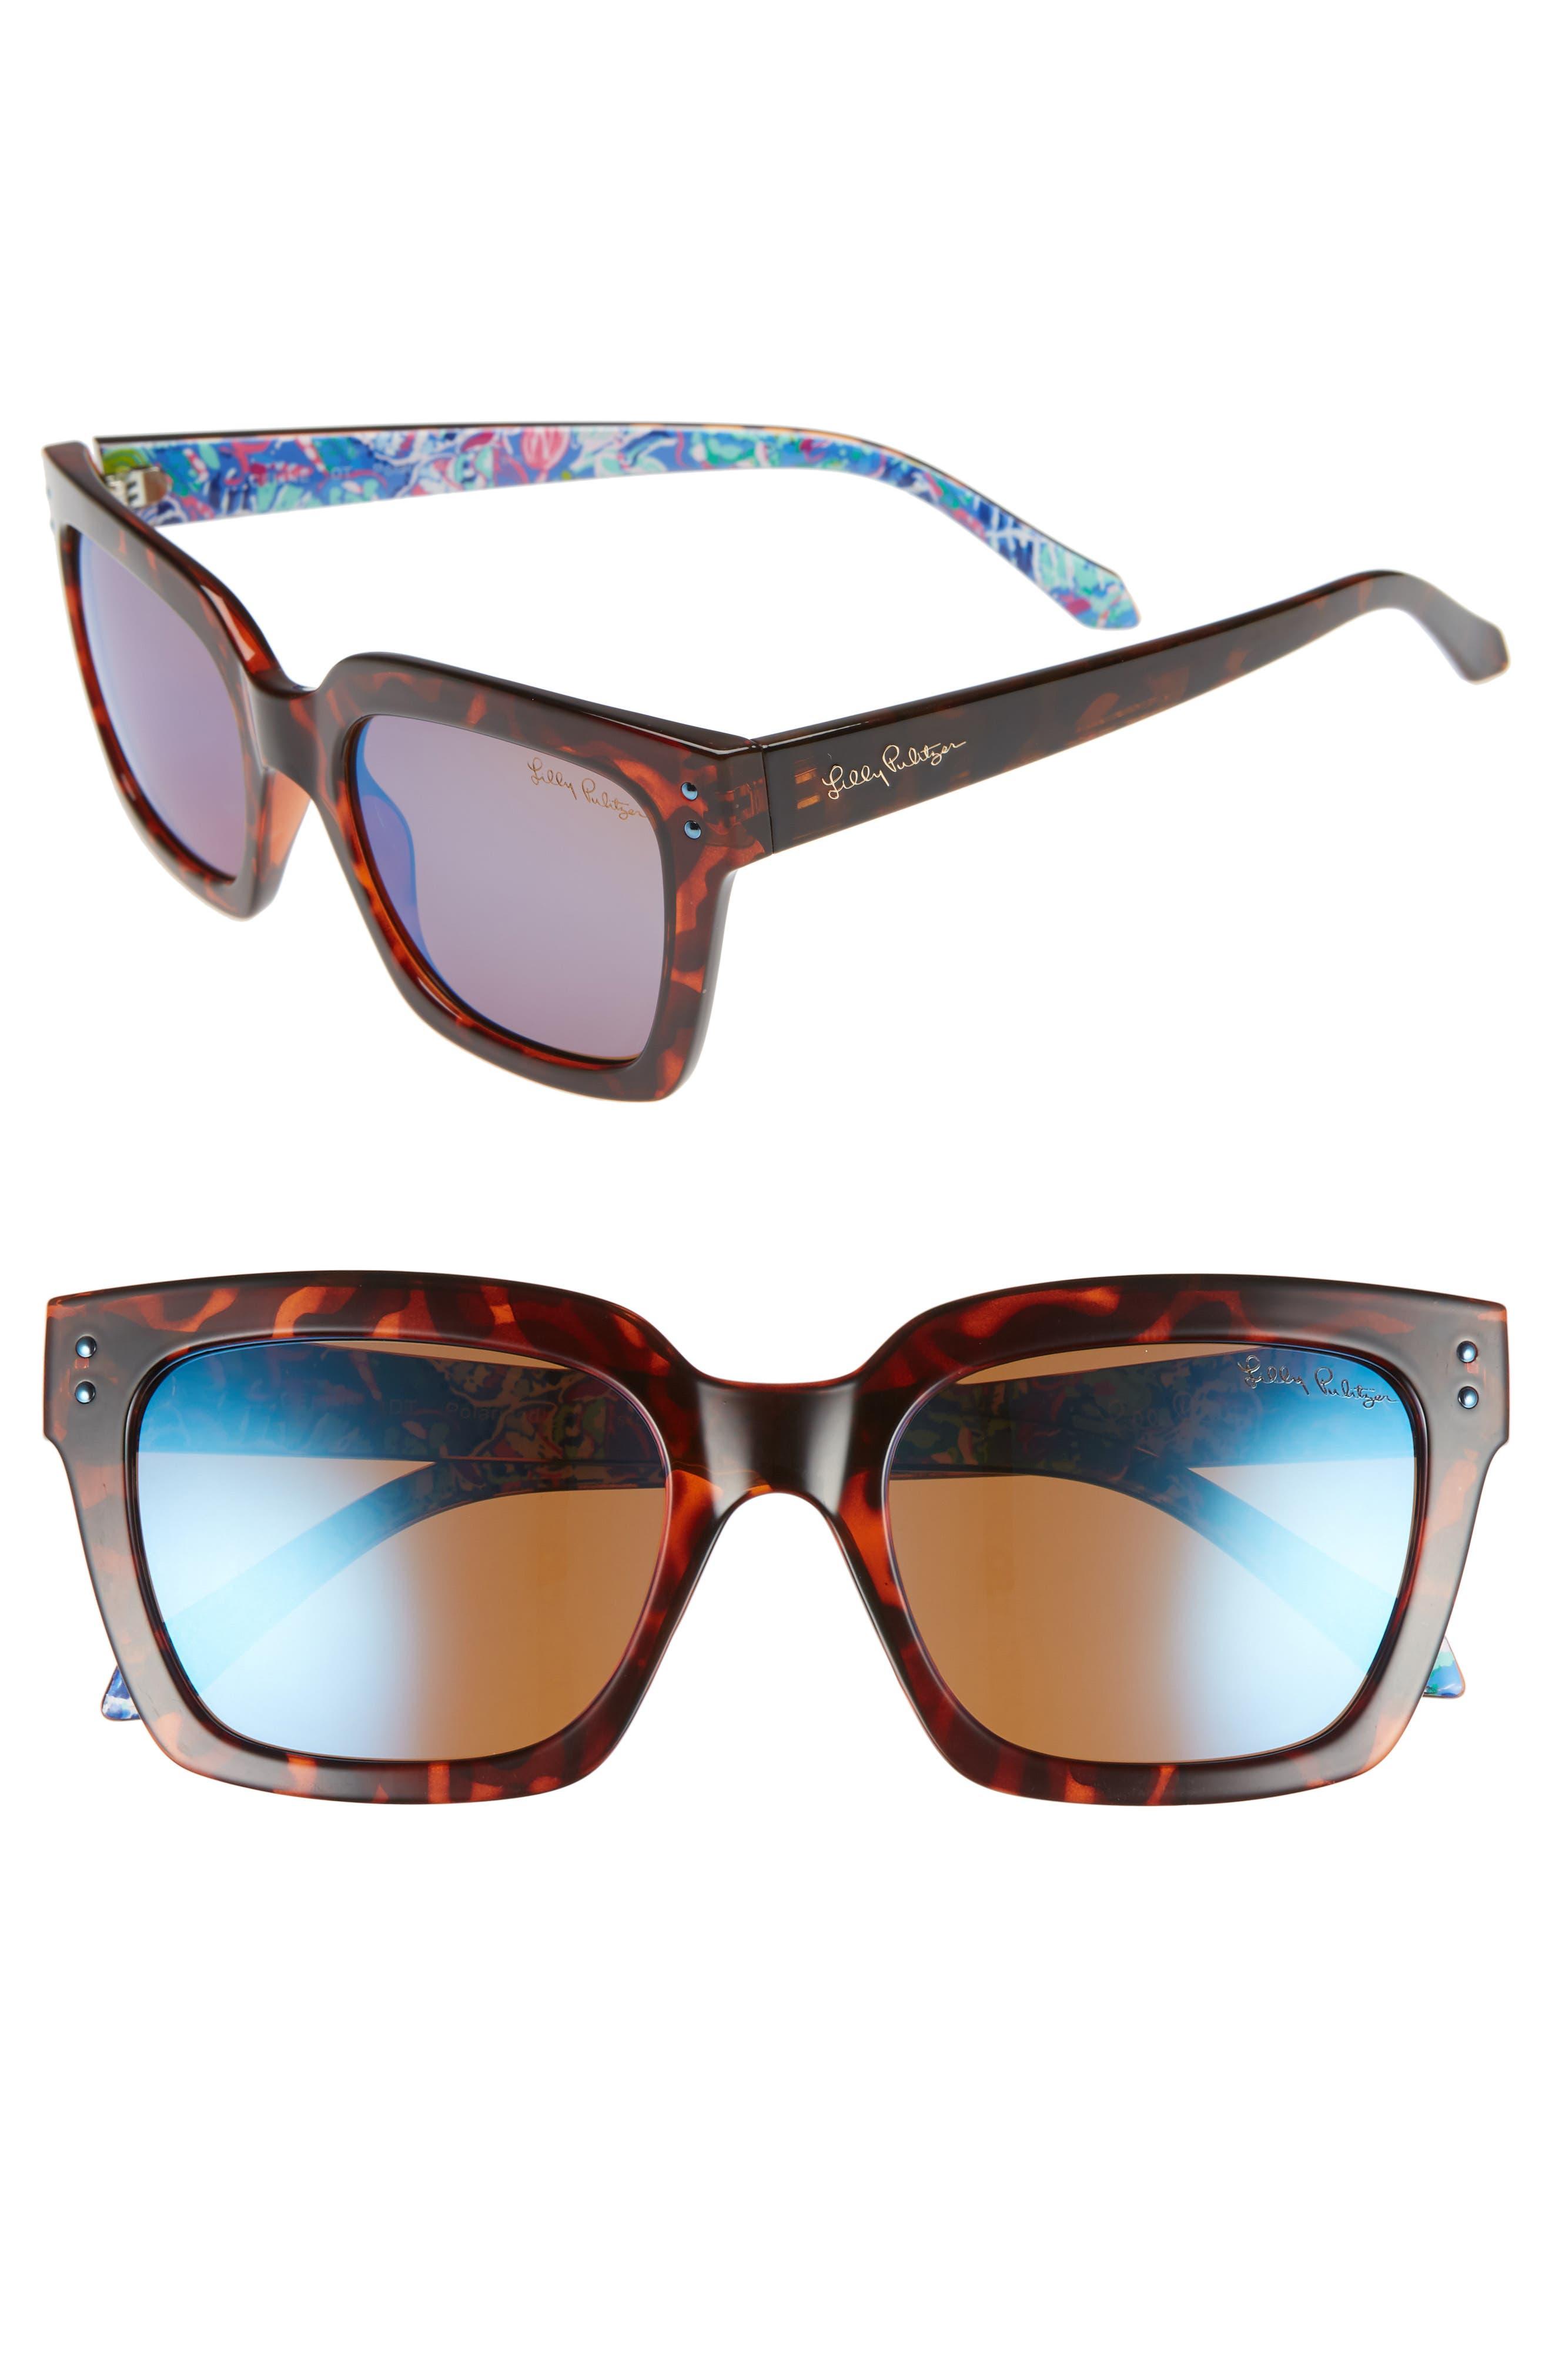 Pulitzer® WomenNordstrom Sunglasses Lilly For For Pulitzer® Lilly WomenNordstrom Sunglasses Lilly nOwv8mN0